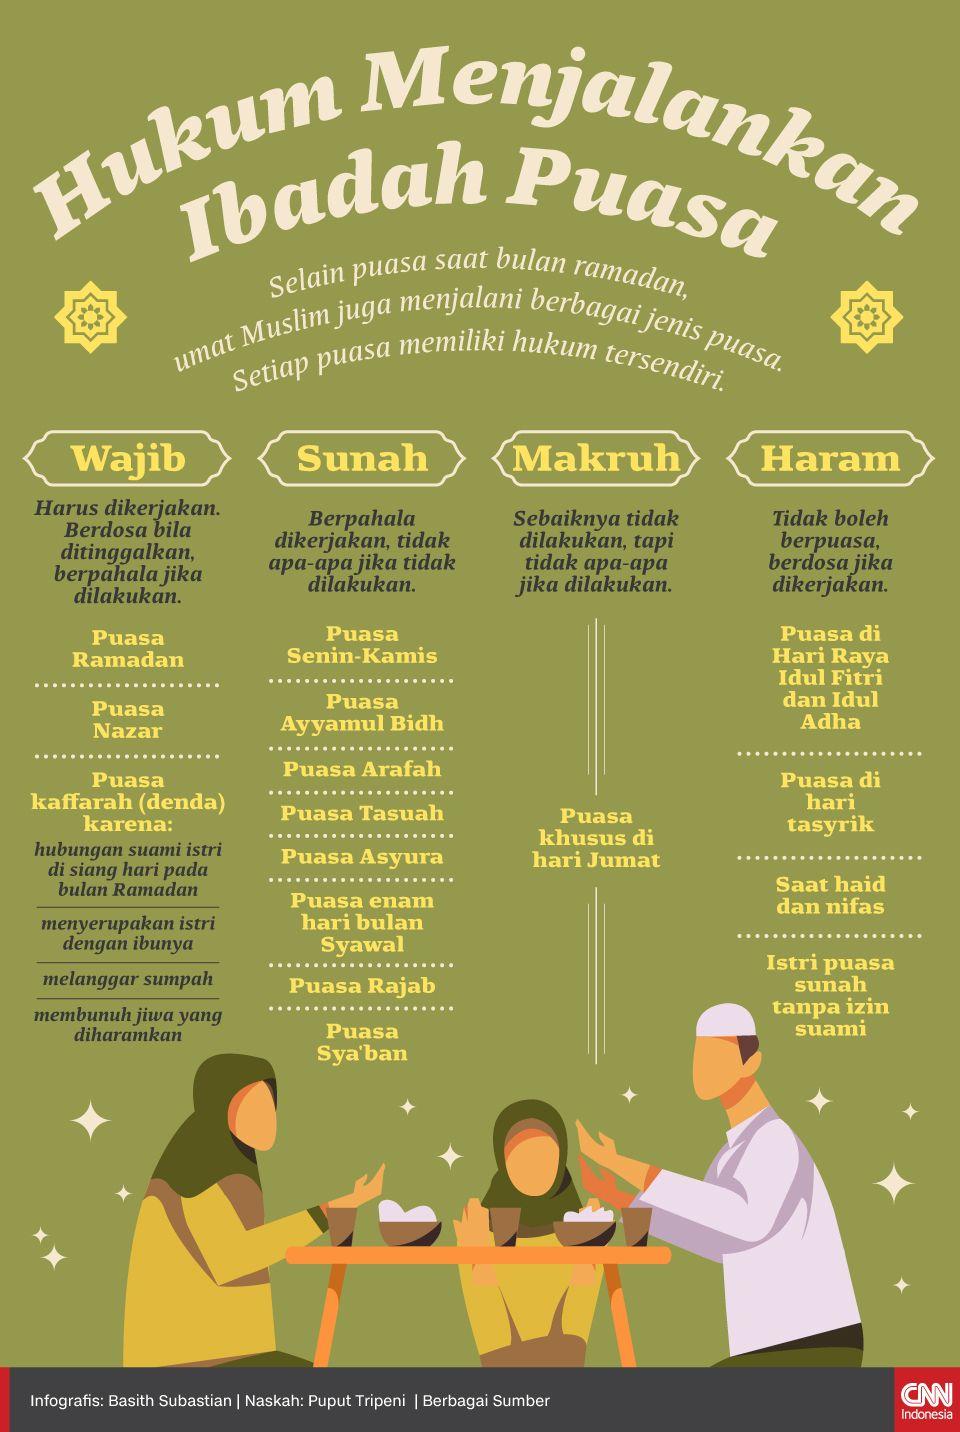 Infografis Hukum Menjalankan Ibadah Puasa